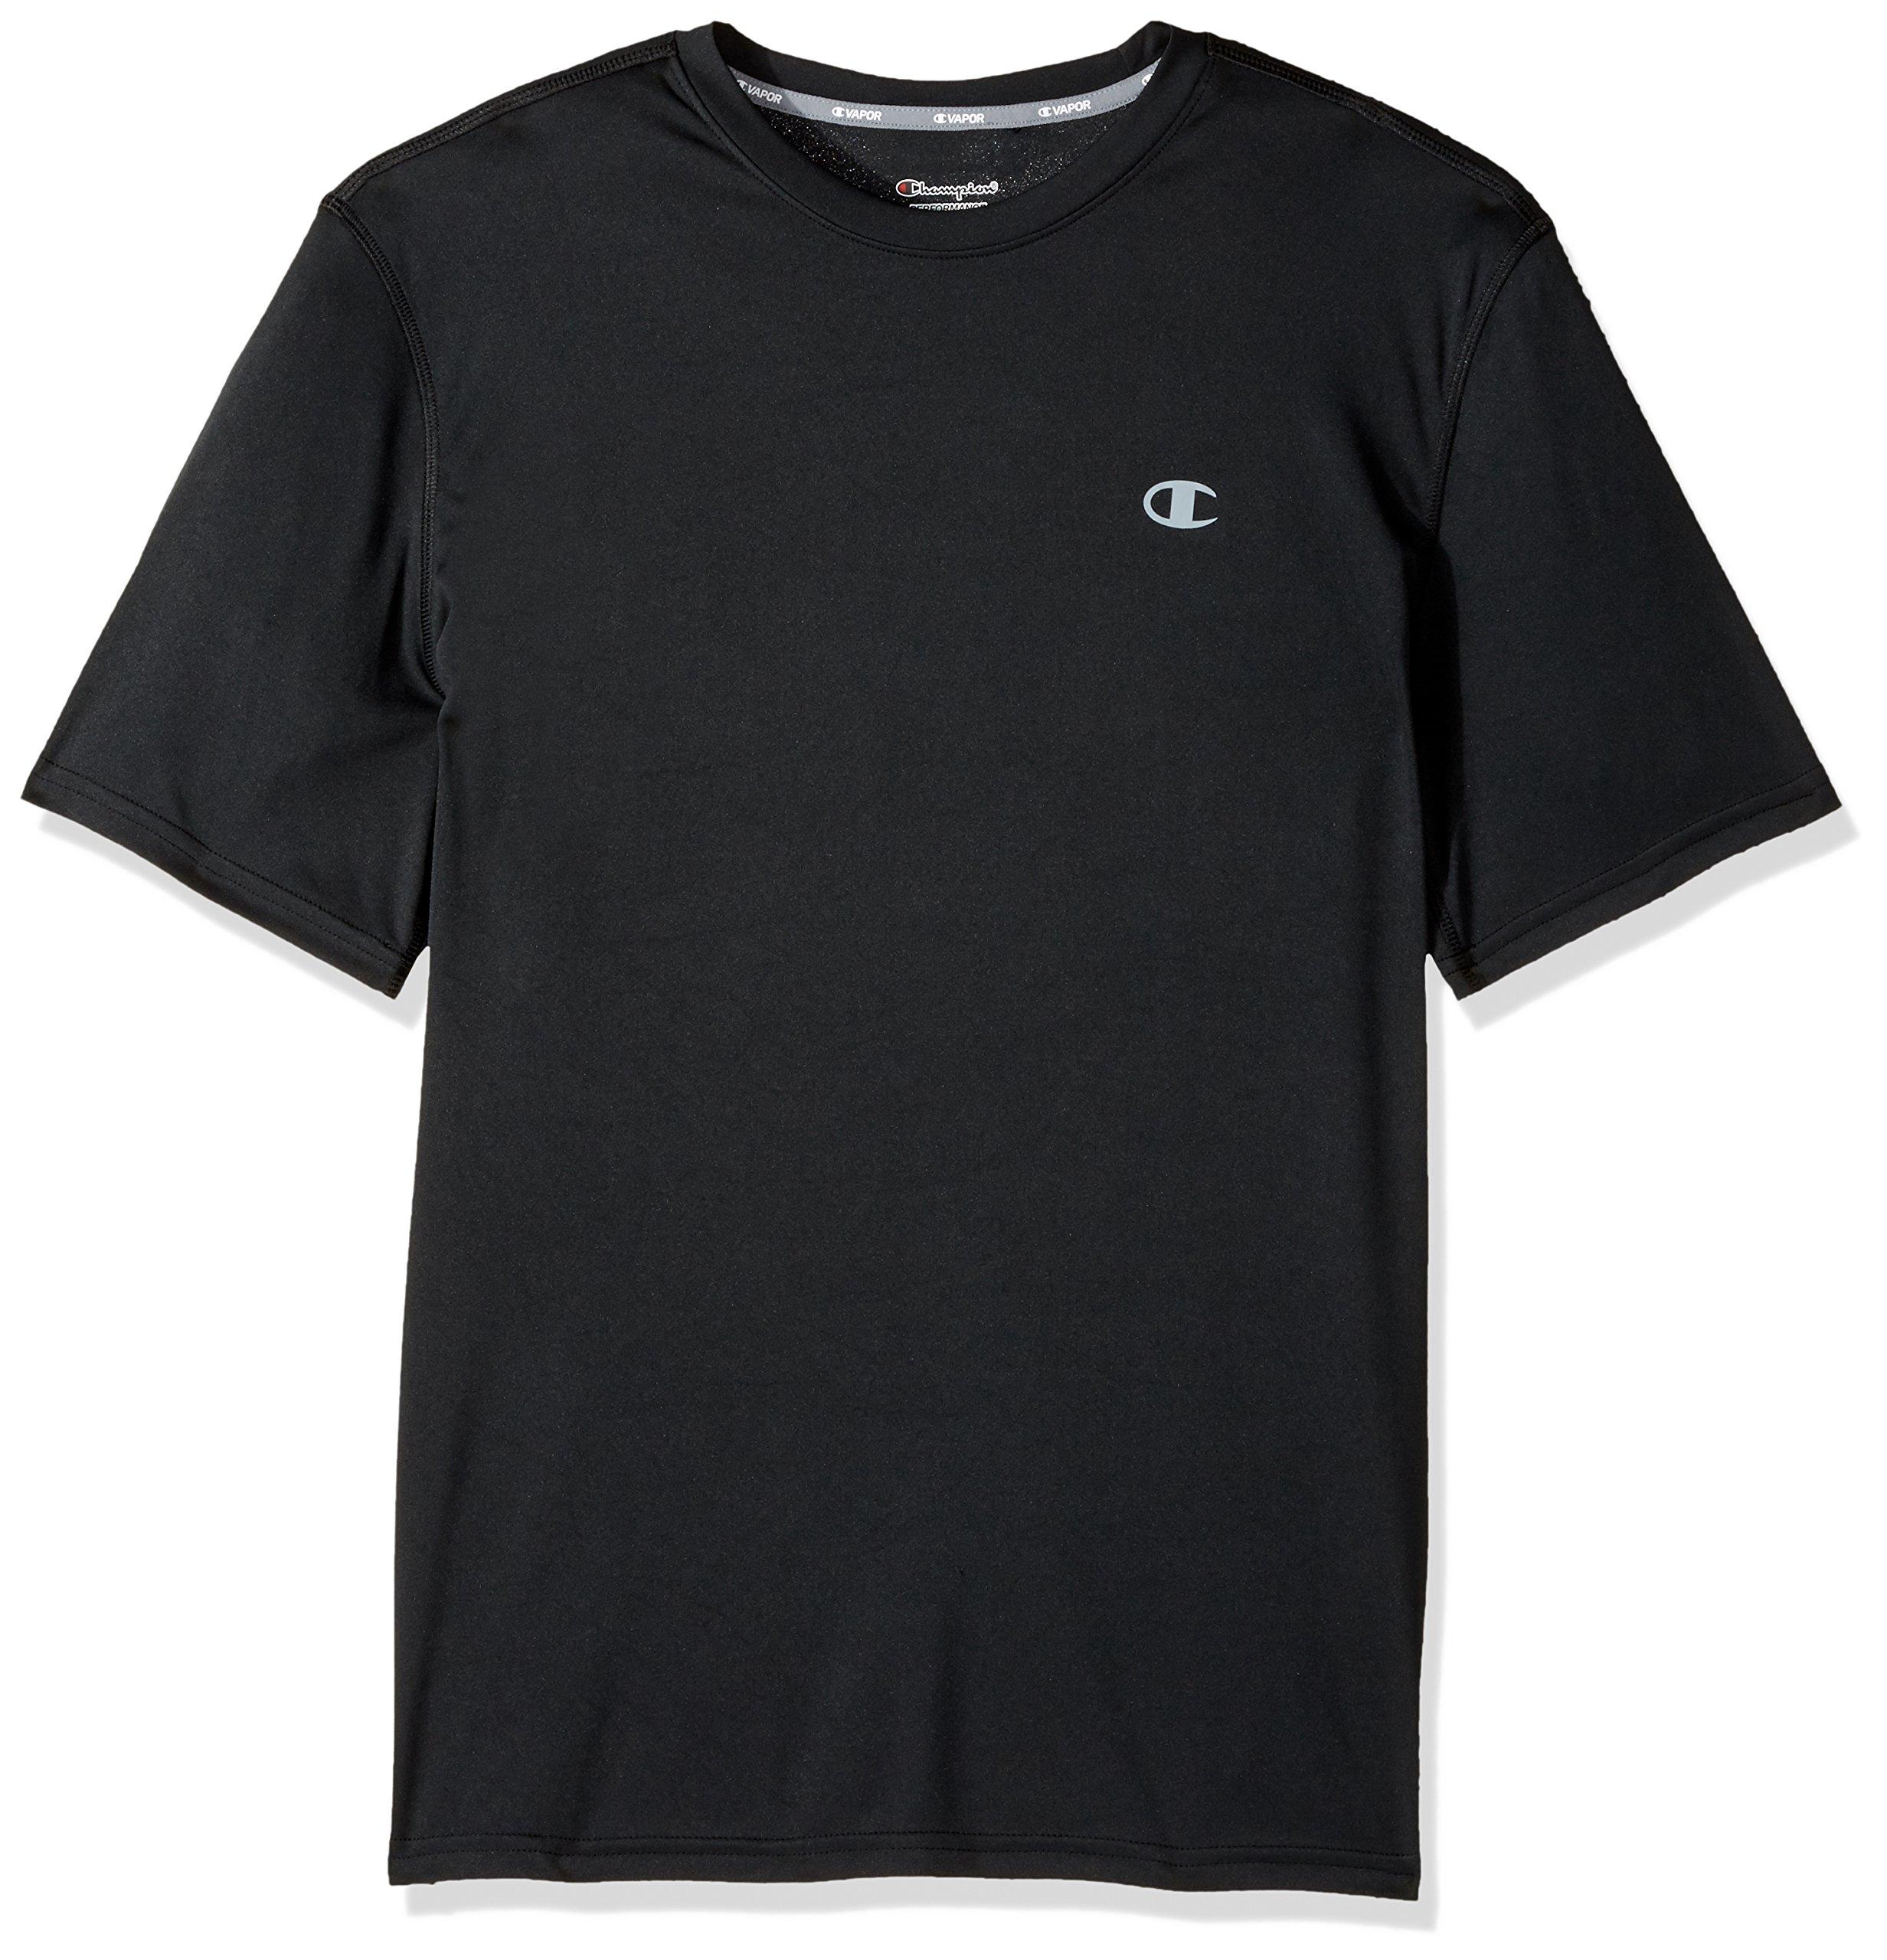 Champion Men's Double Dry T-Shirt, Black, XL by Champion